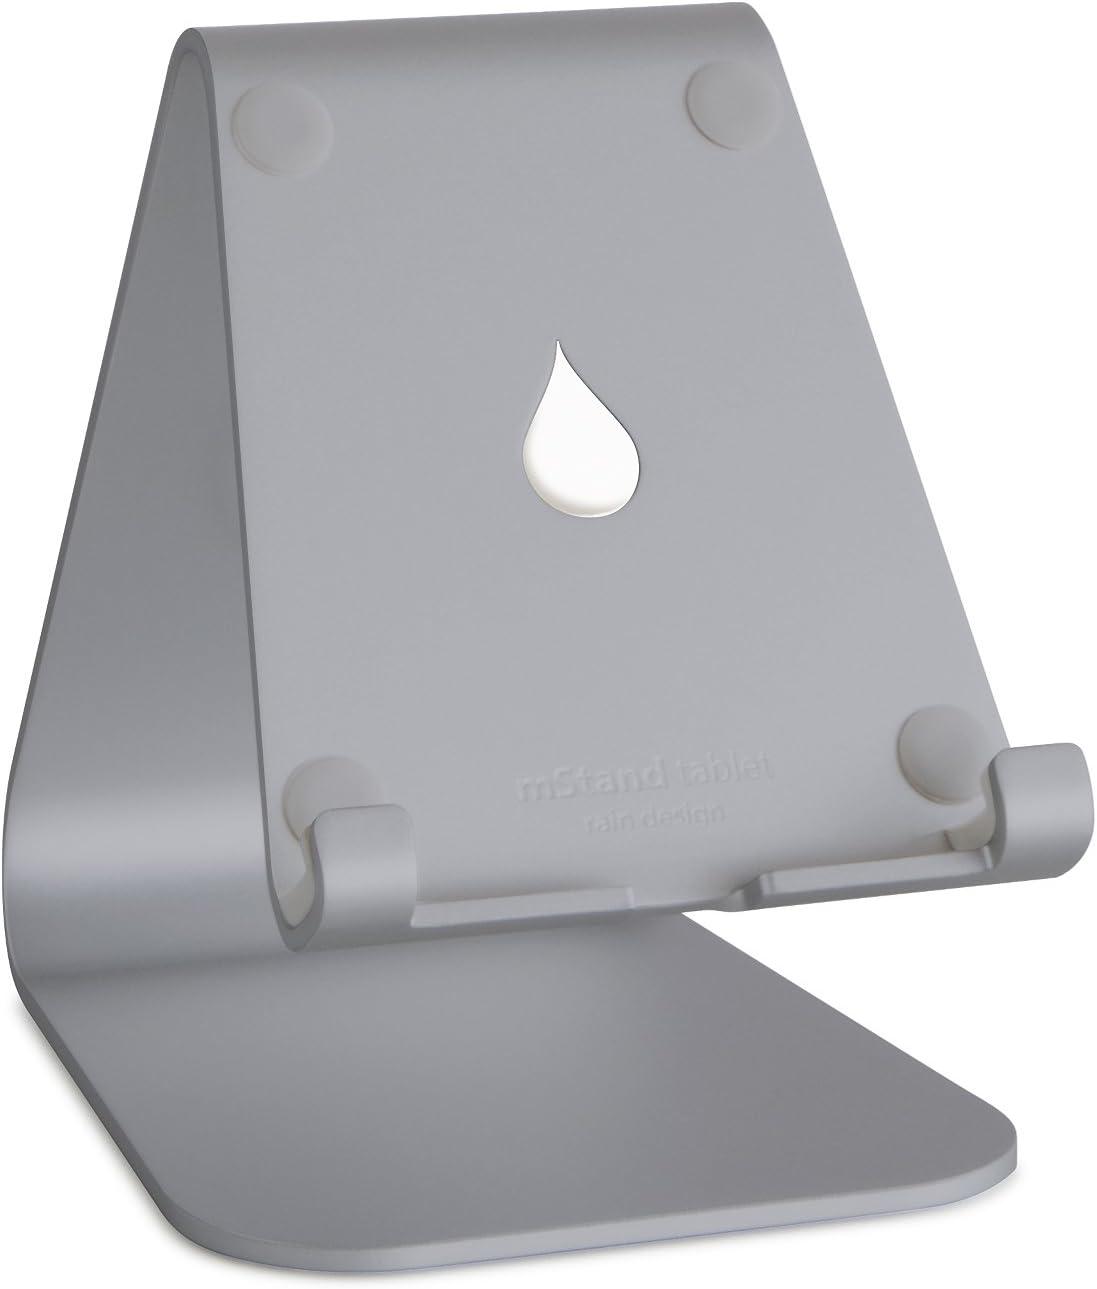 Soporte para tablet Rain Design mStand Tablet, Space Gray